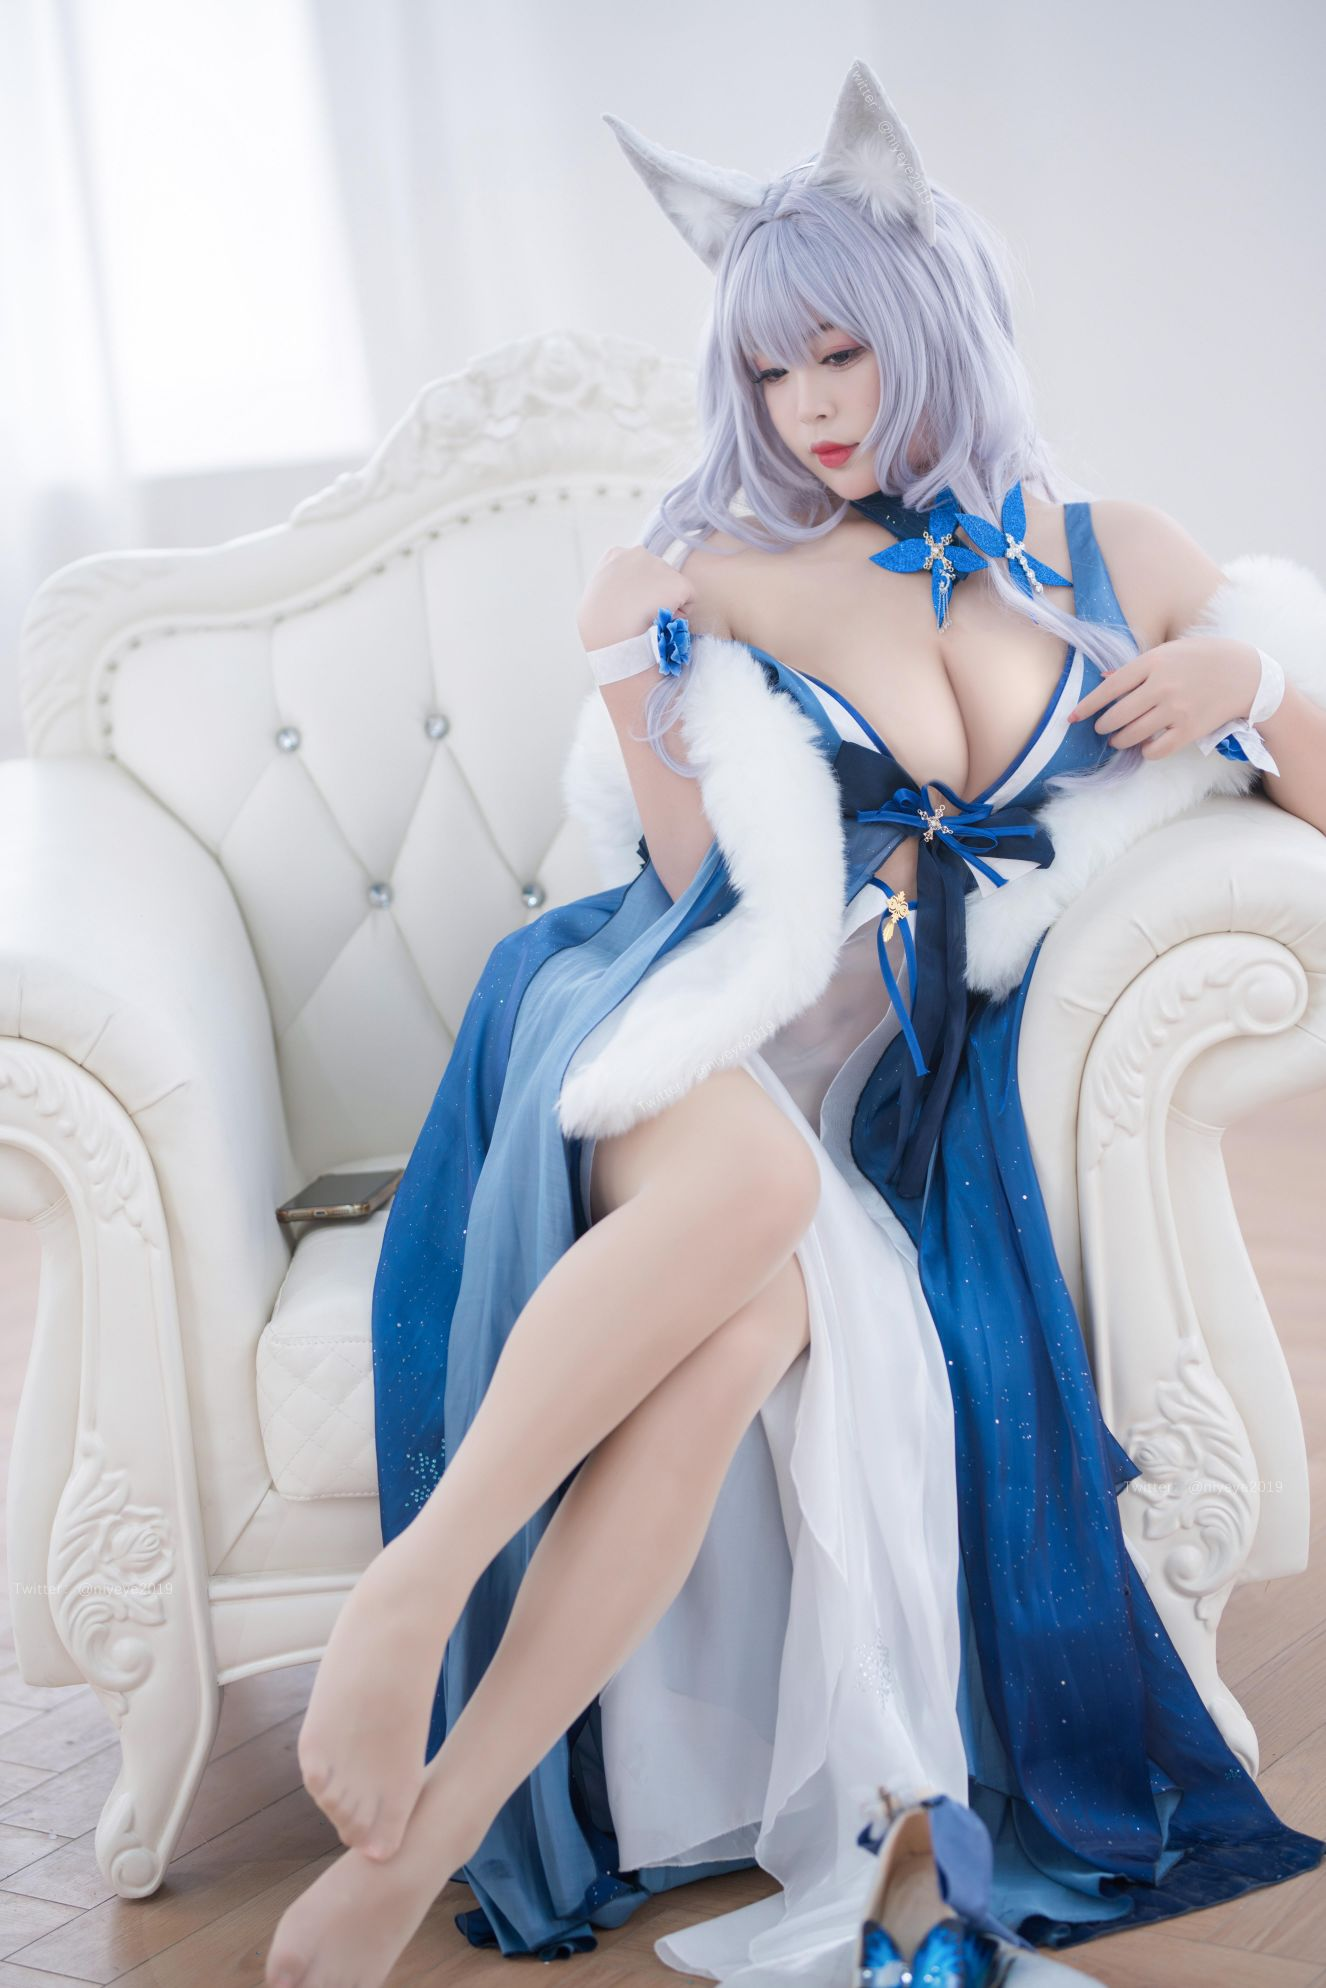 Azur Lane Shinano Cosplay by Bai Ye Extra Enticing Inviting 12